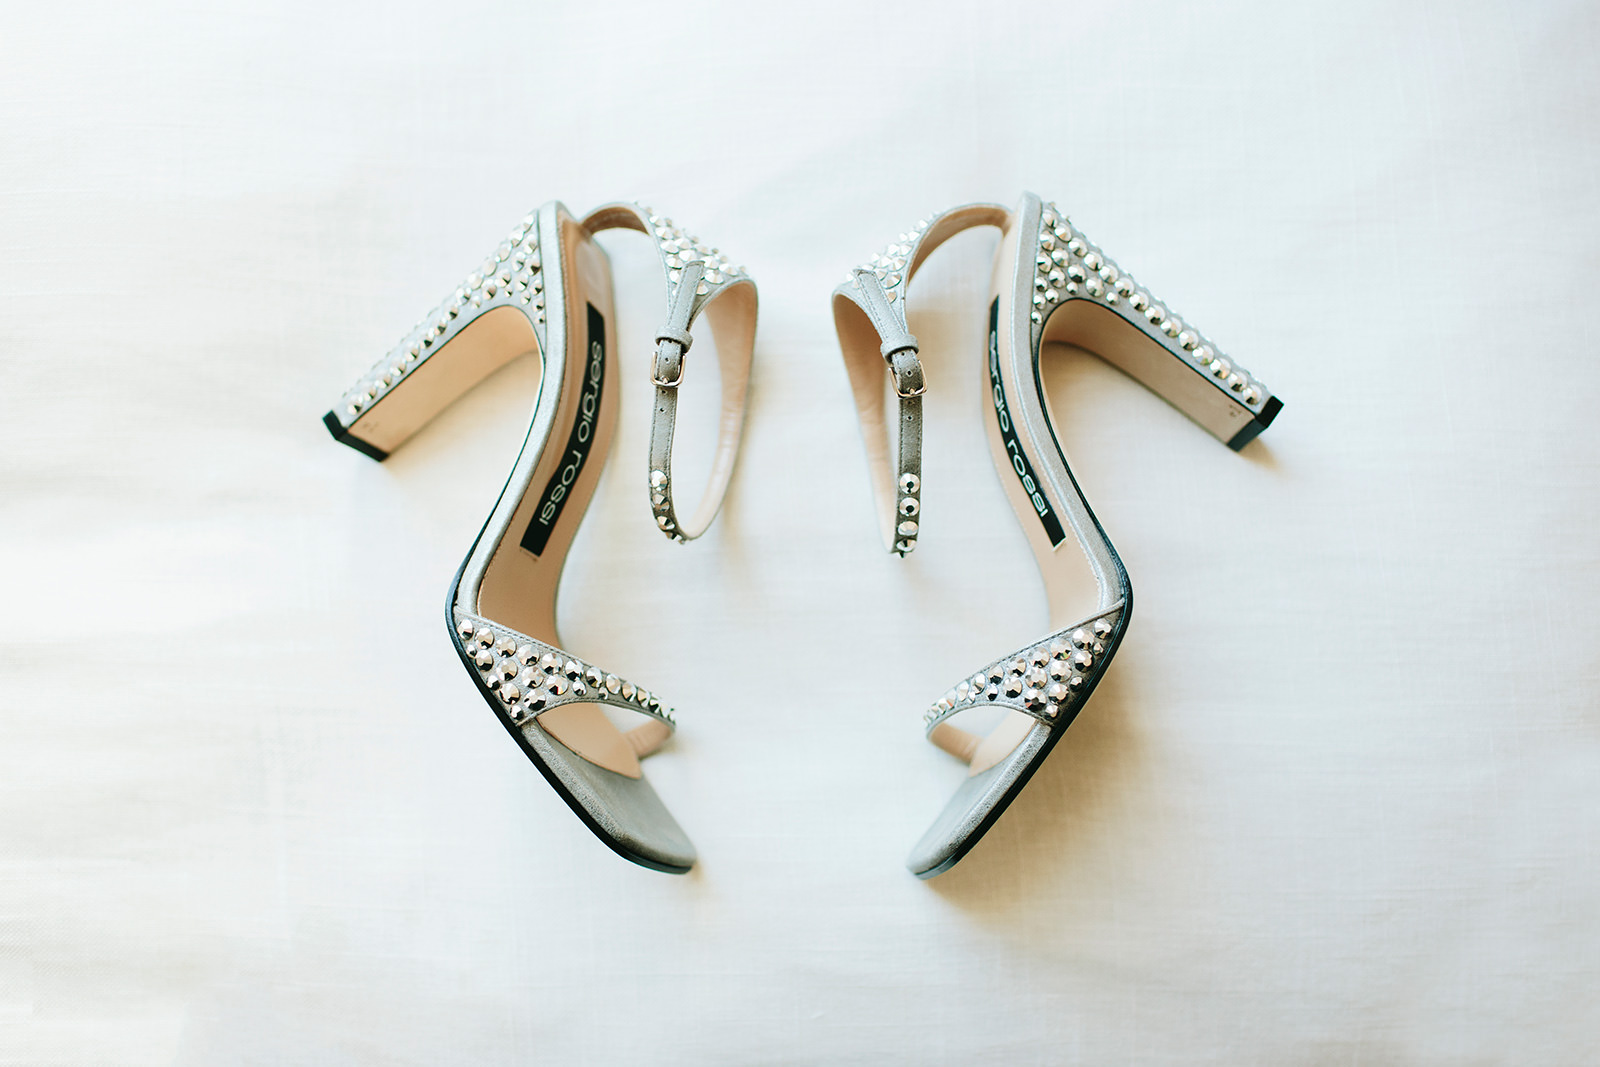 sergio rossi studded heels